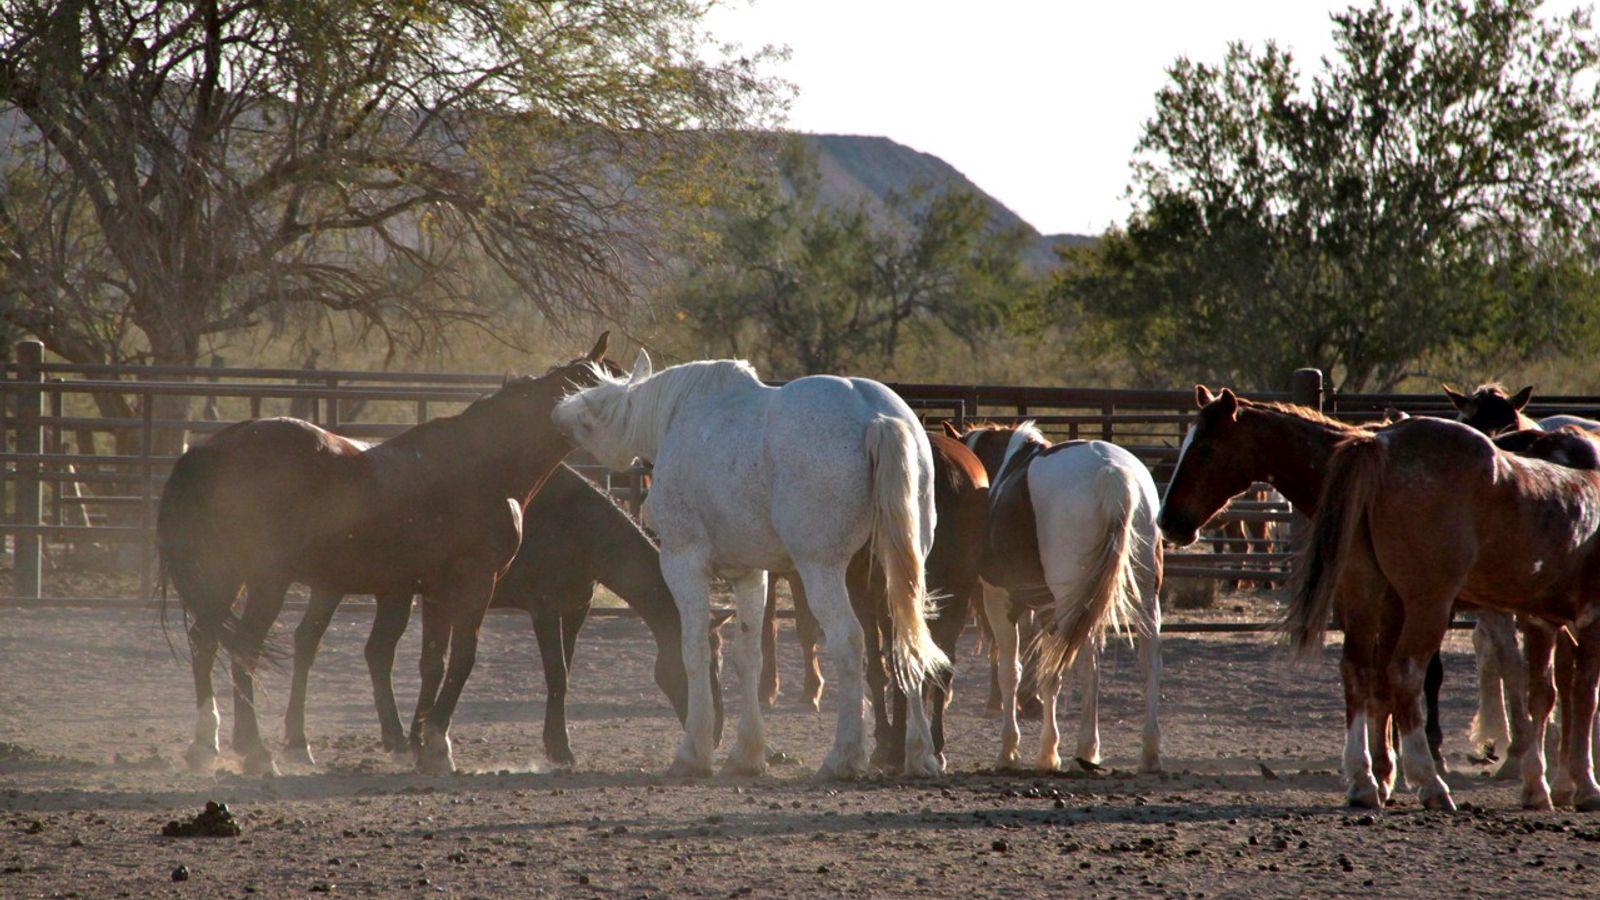 Horses outdoors